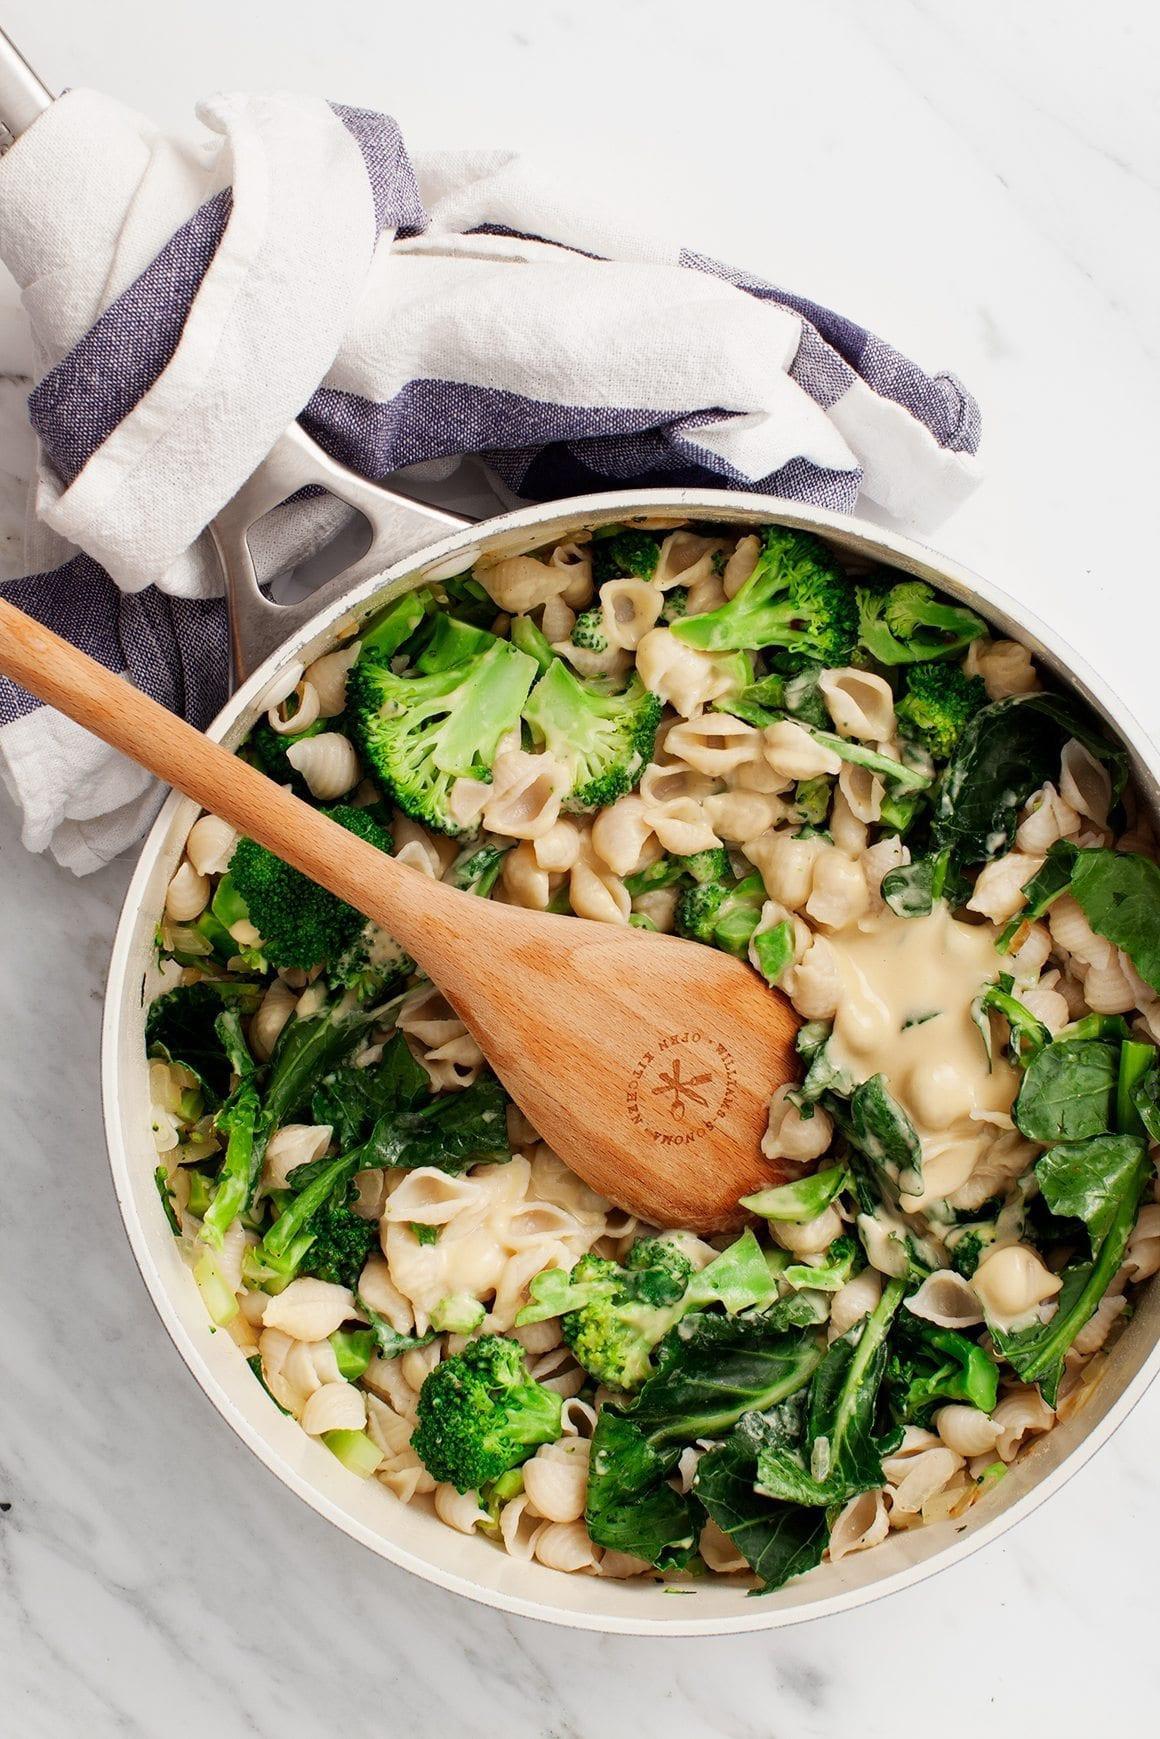 Healthy Vegan Dinner Recipes  Healthy Ve arian Dinner Recipes Love and Lemons